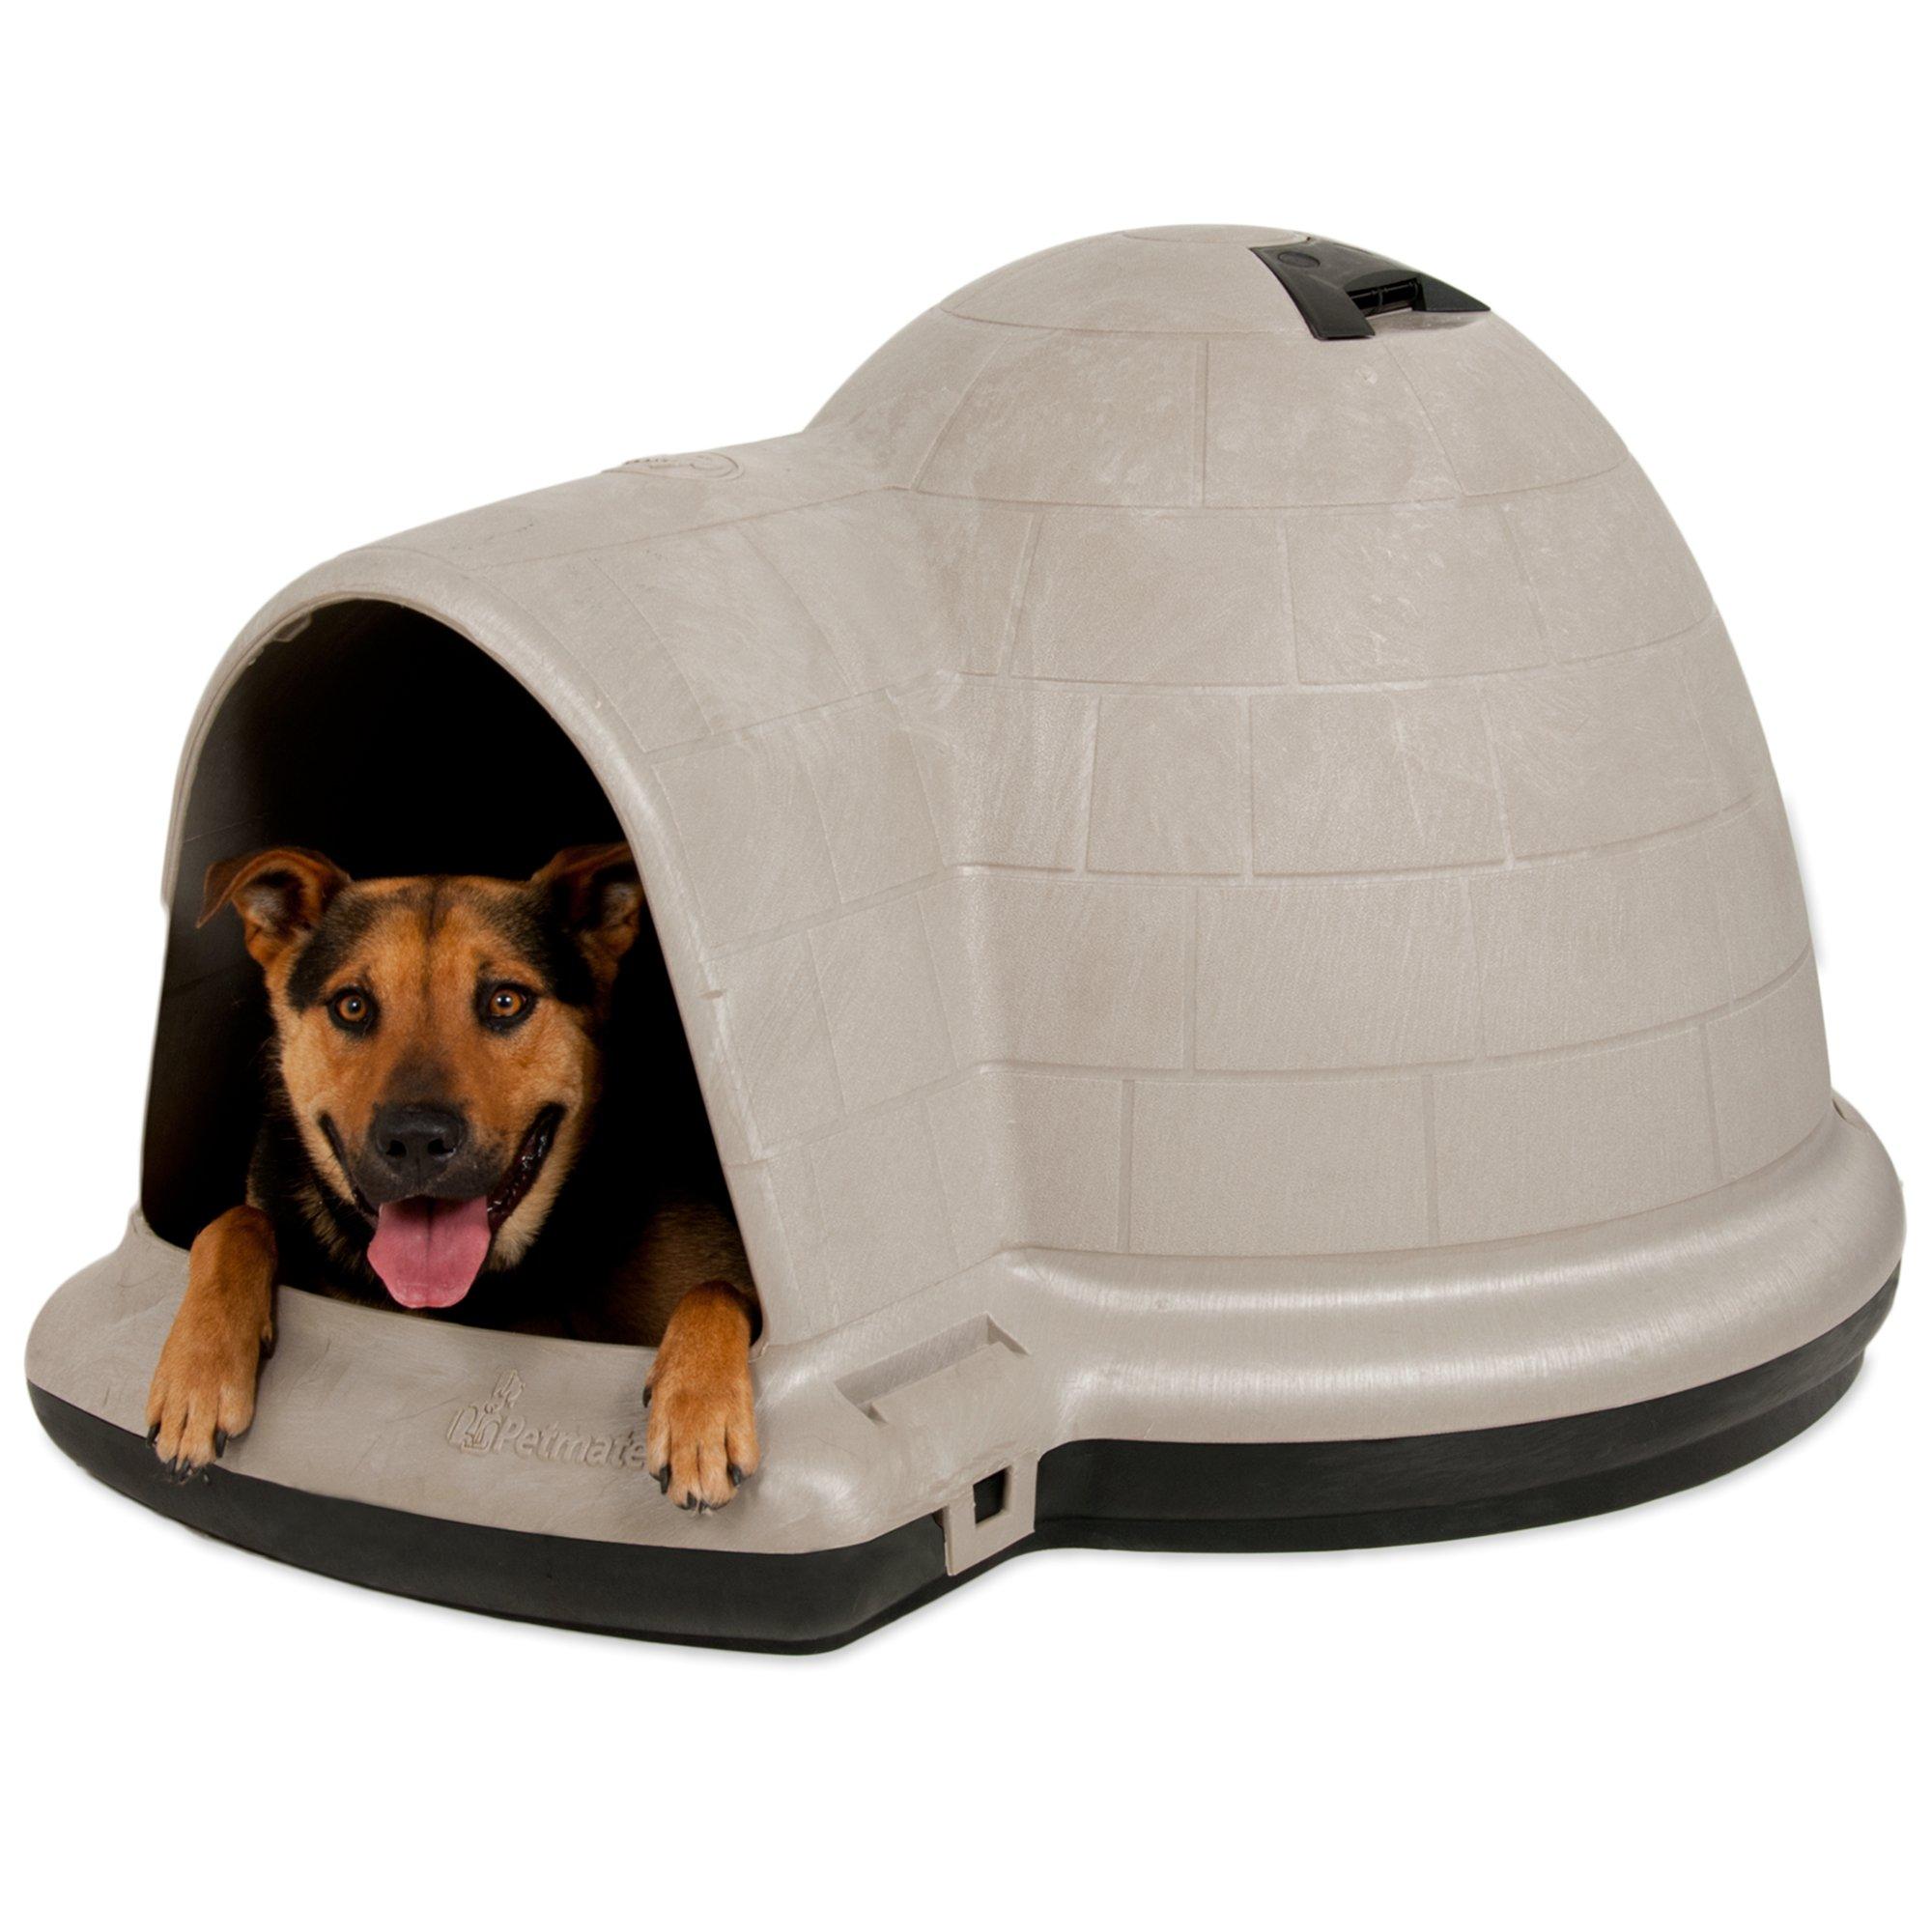 sc 1 st  Petco & Igloo Dog House: Petmate Indigo Dog Home | Dog Igloo | Petco